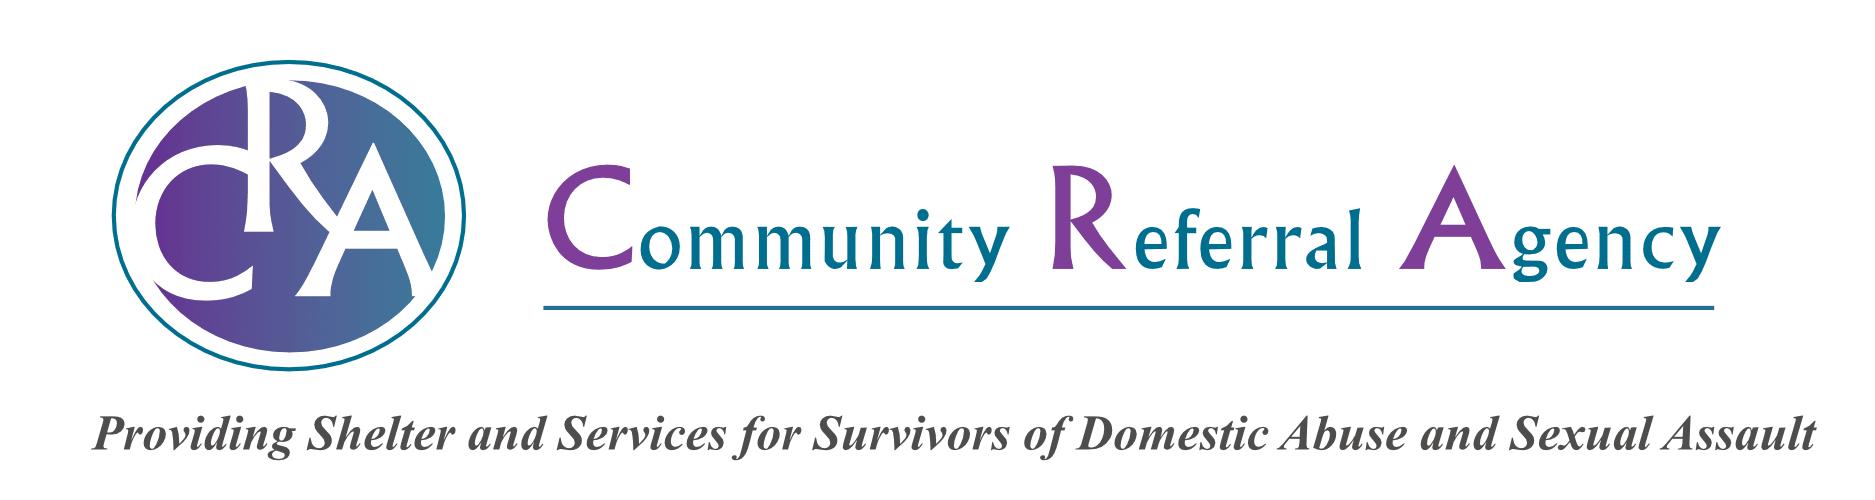 Community Referral Agency